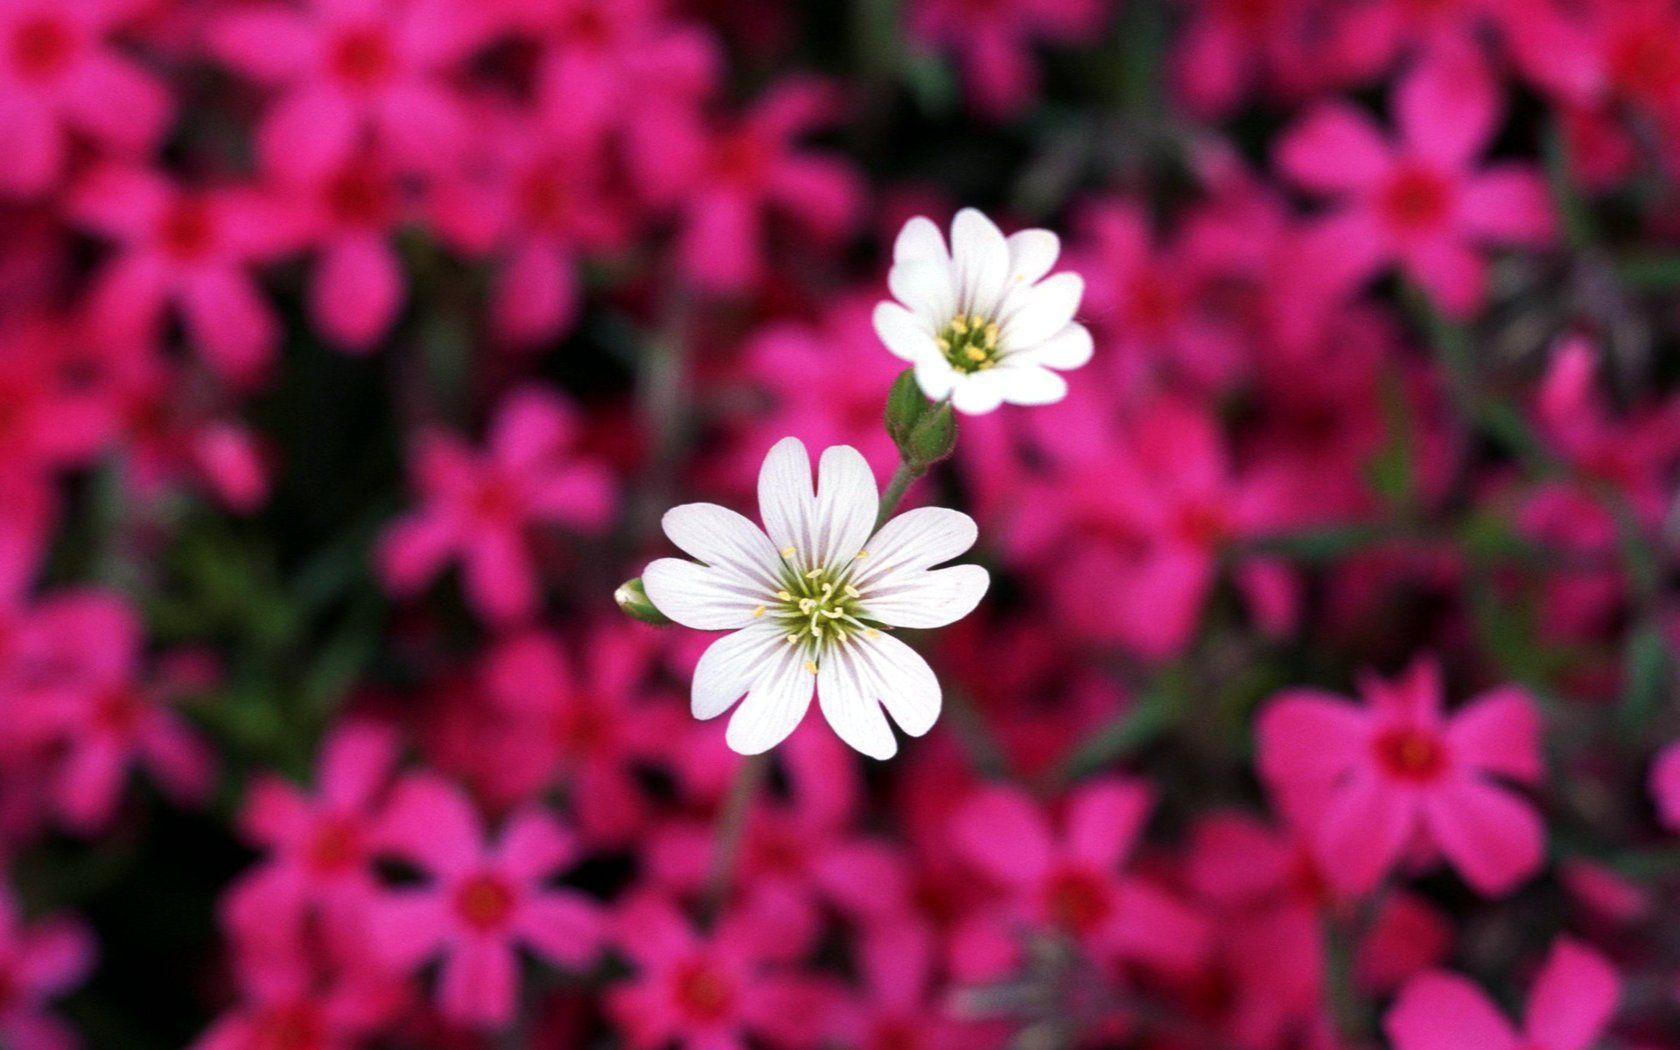 Flower High Quality Desktop Wallpapers Top Free Flower High Quality Desktop Backgrounds Wallpaperaccess